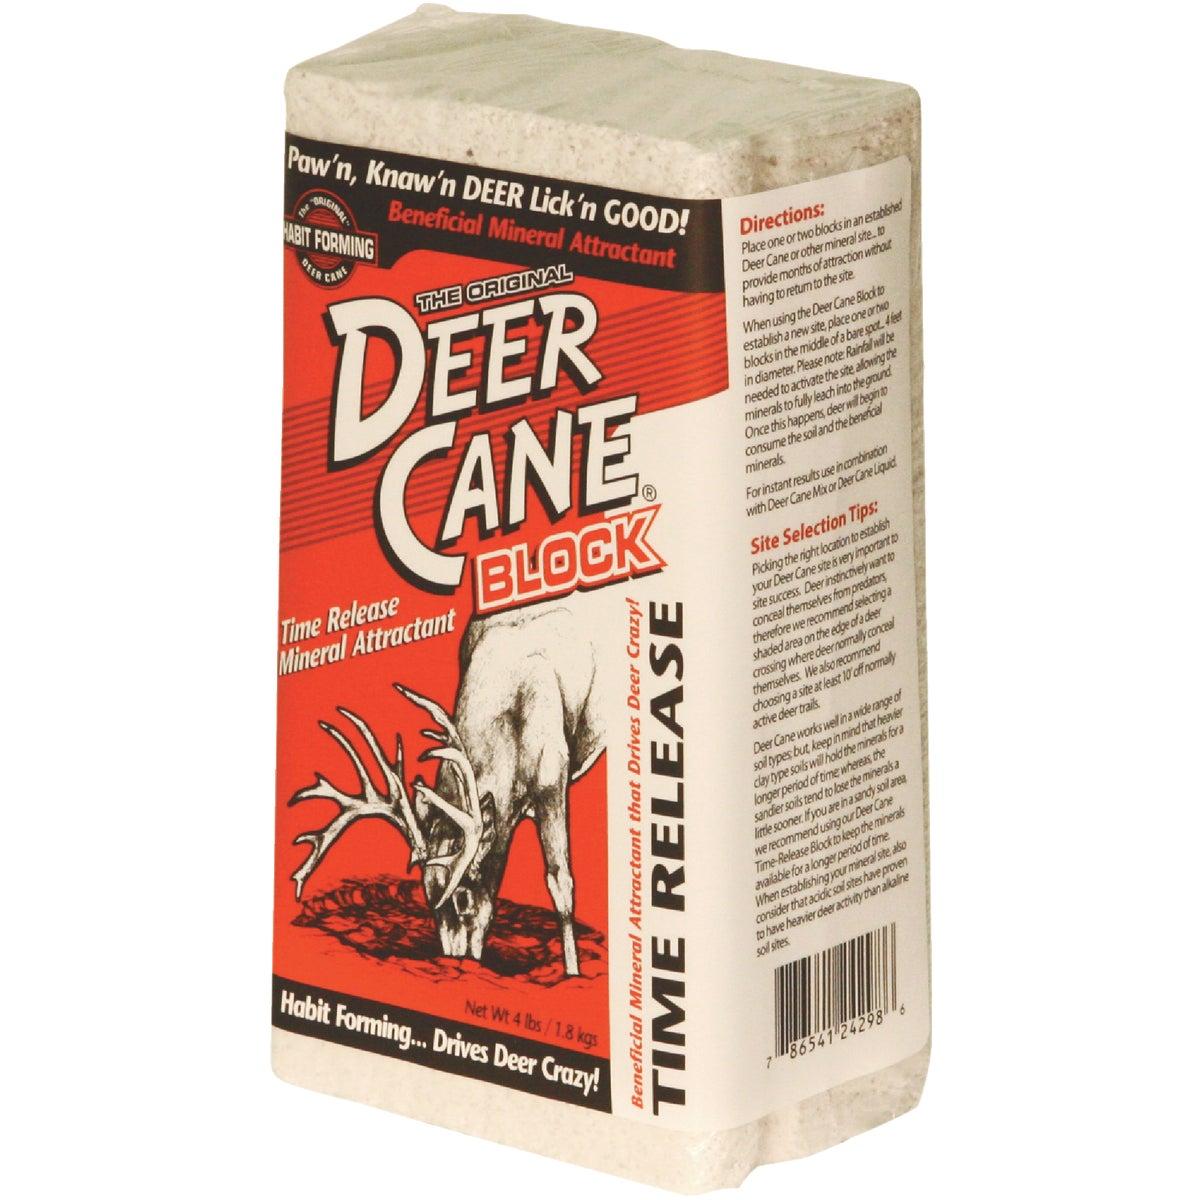 DEER CANE BLOCK